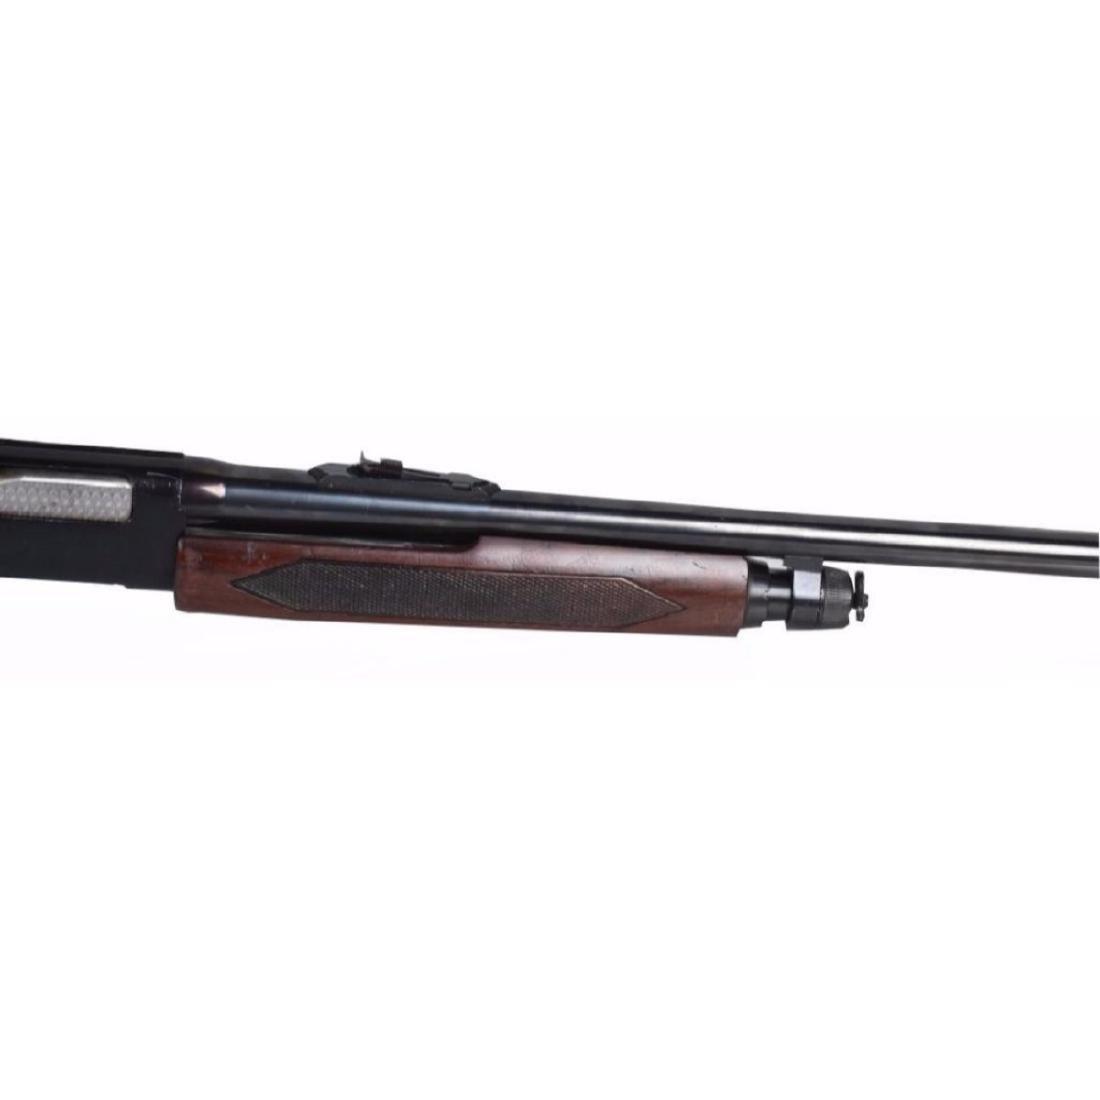 Winchester Model 1200 12 Ga Pump Shotgun - 2